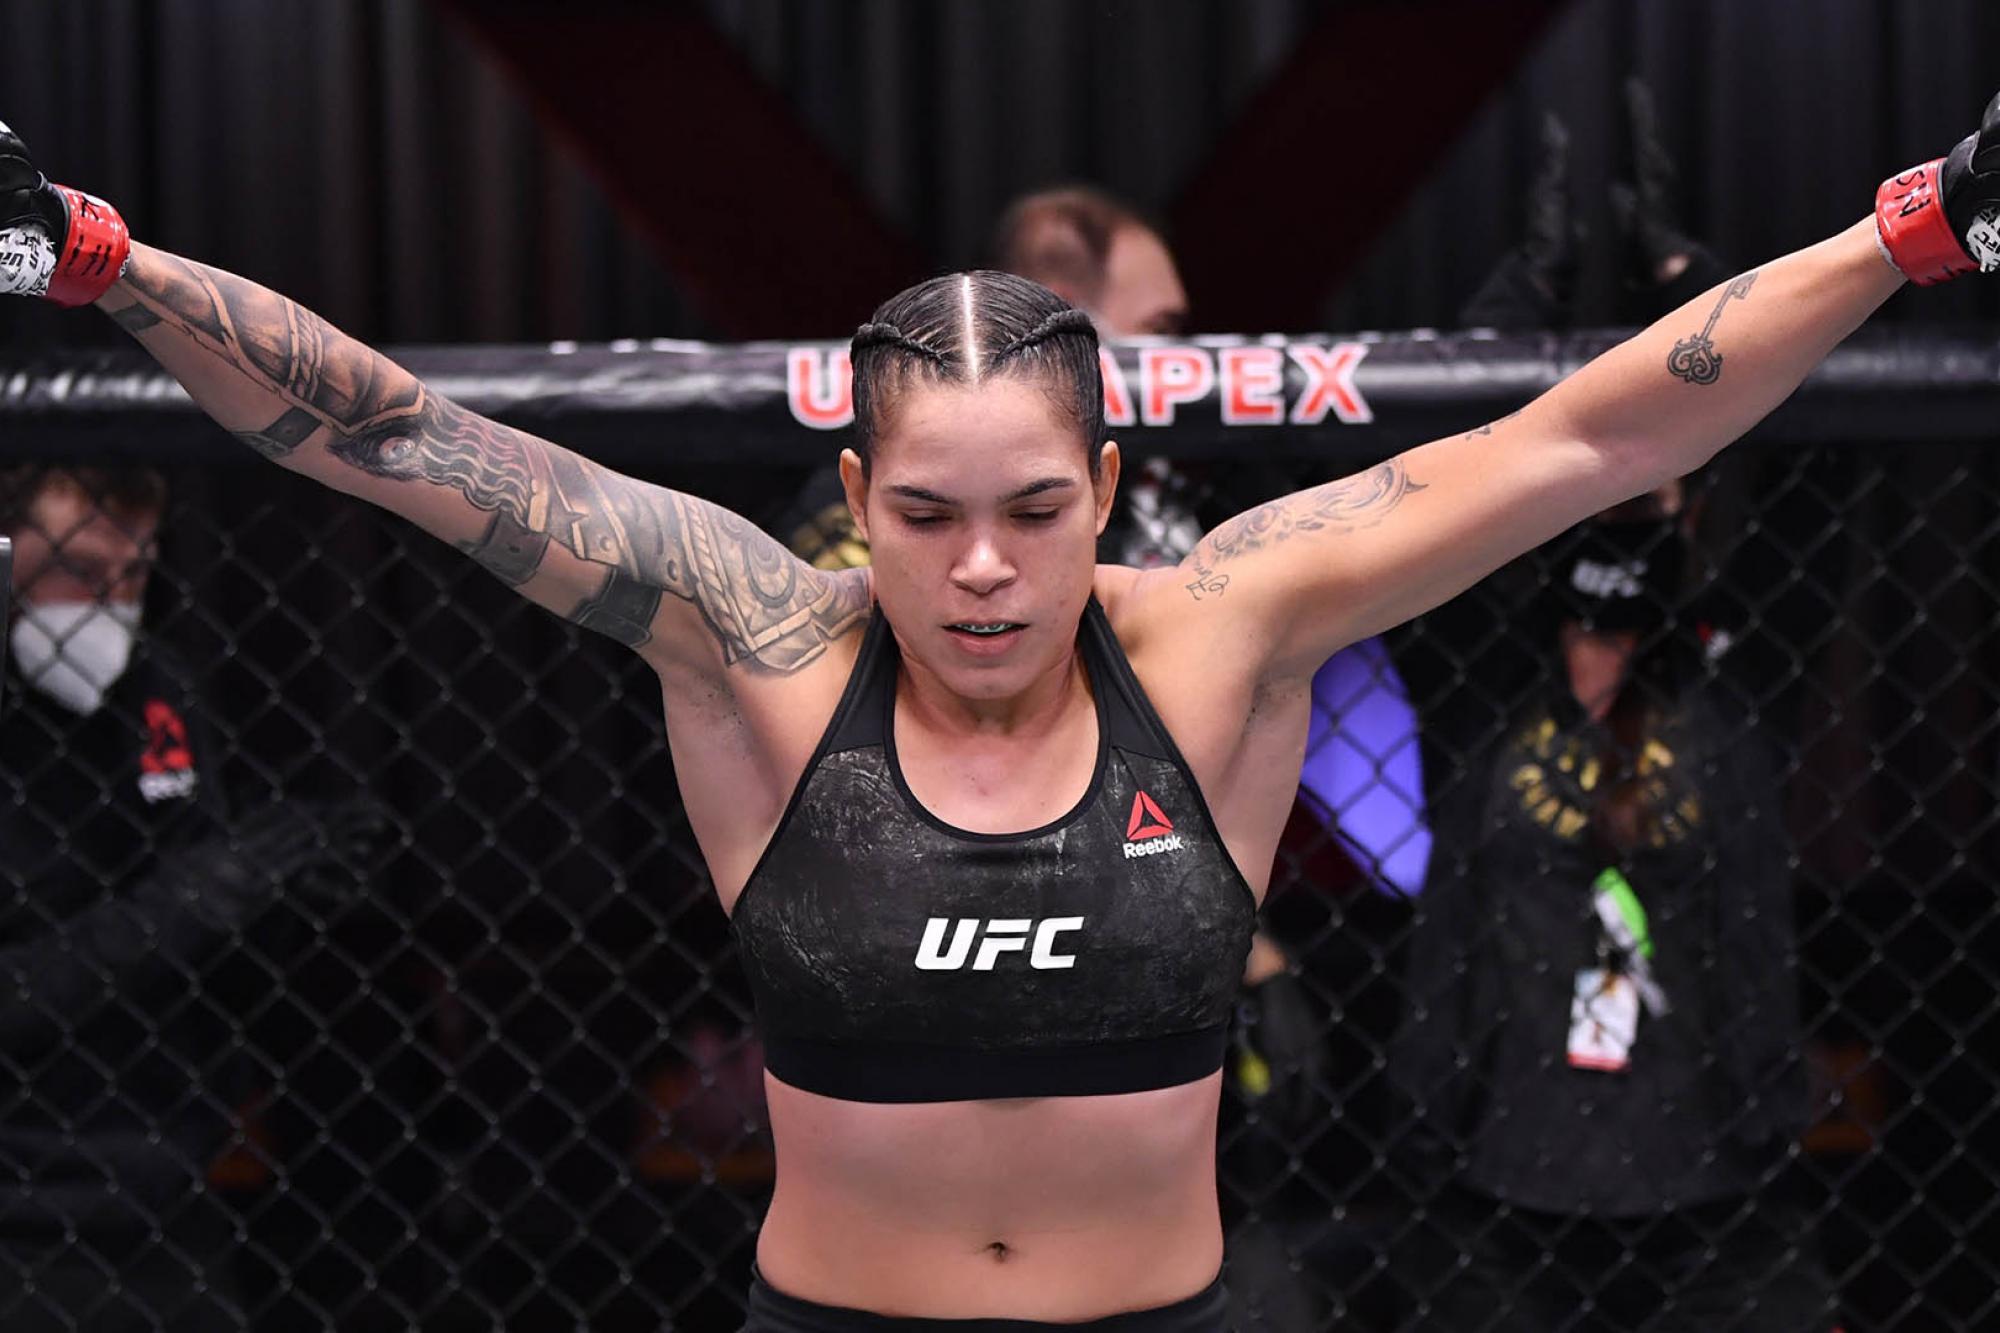 Champion Check-In: Amanda Nunes' Greatness | UFC